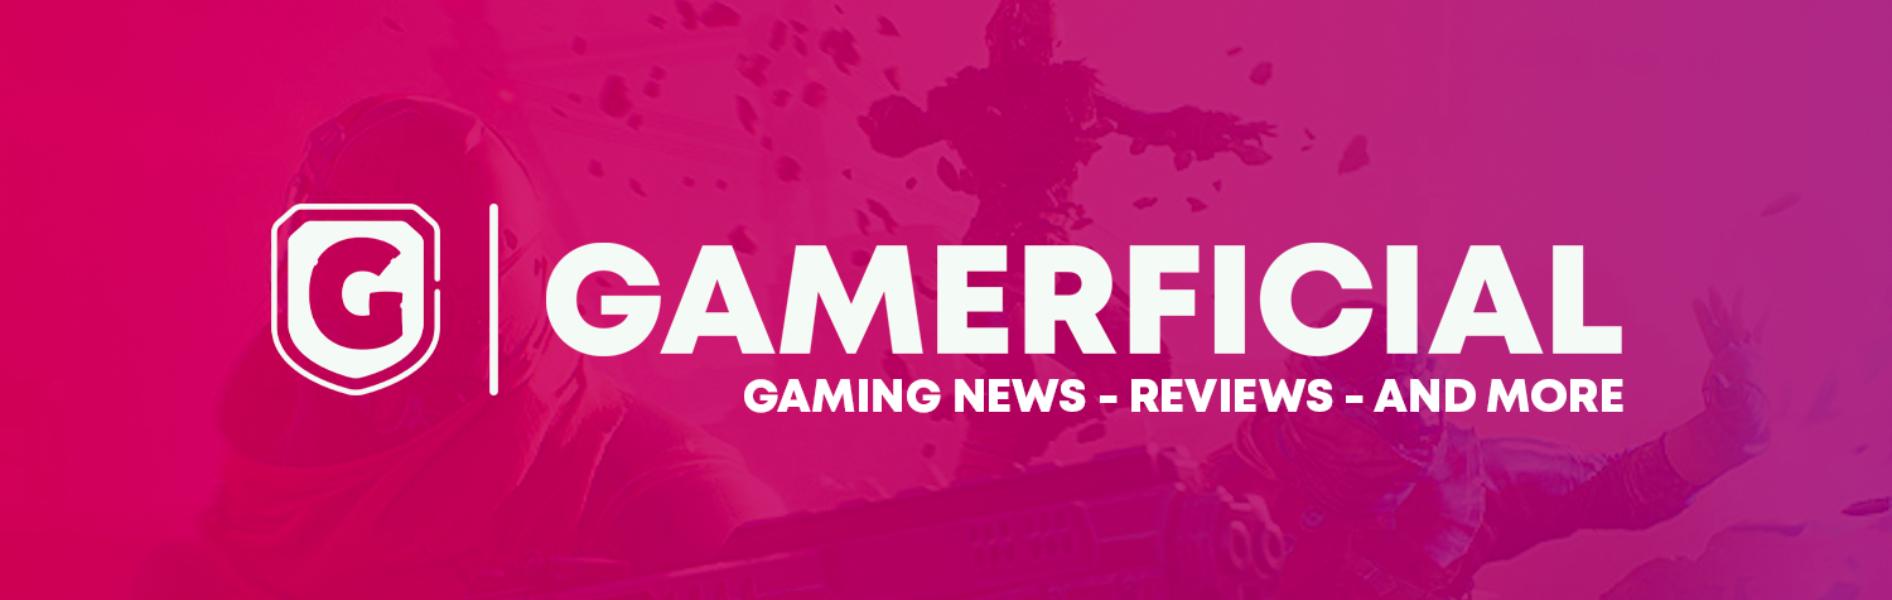 Gamerficial Banner